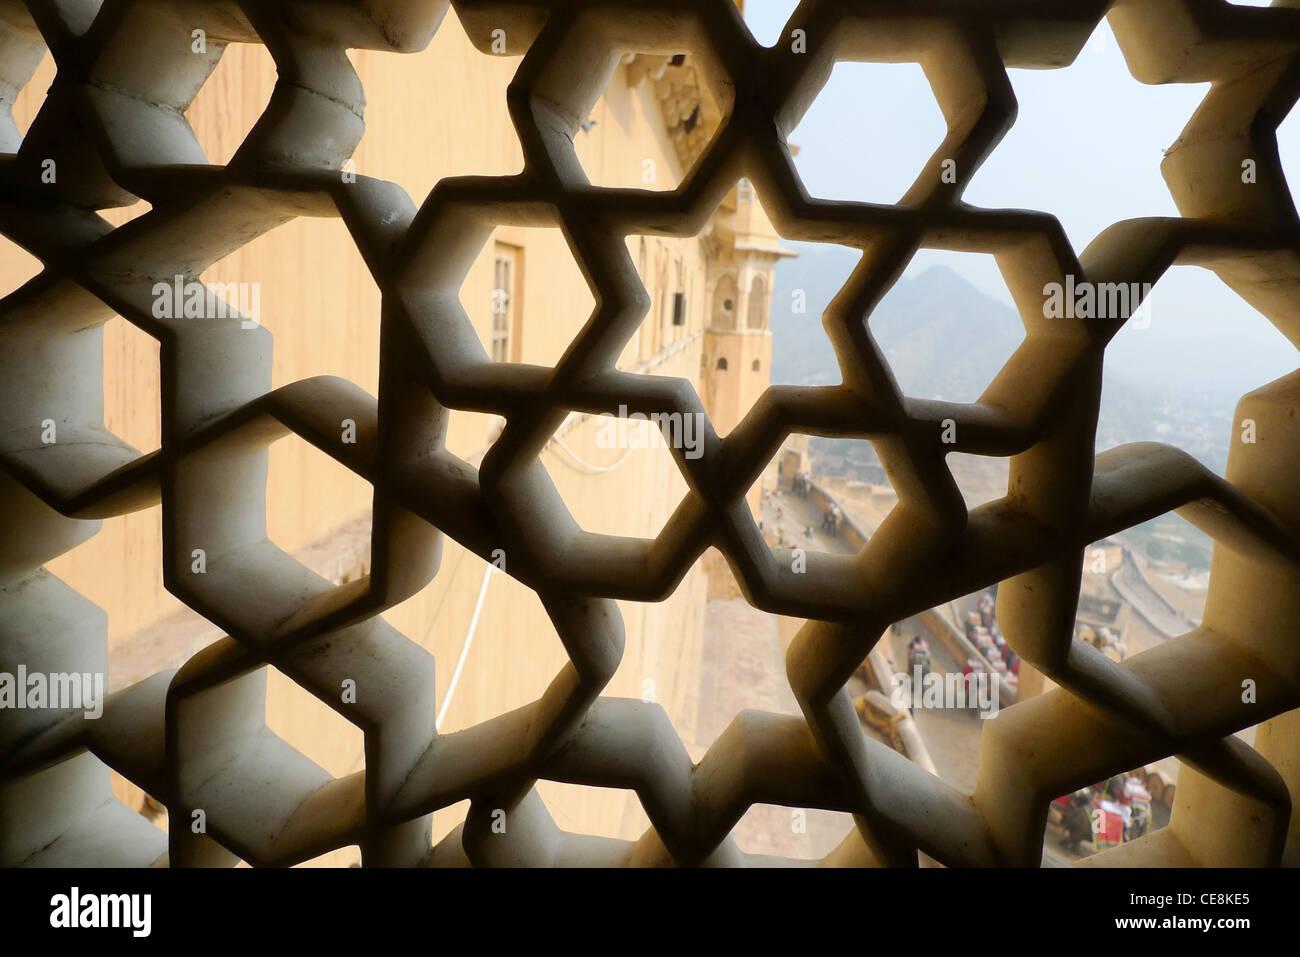 Forte Amber, al di fuori di Jaipur, nel Rajasthan, India Immagini Stock